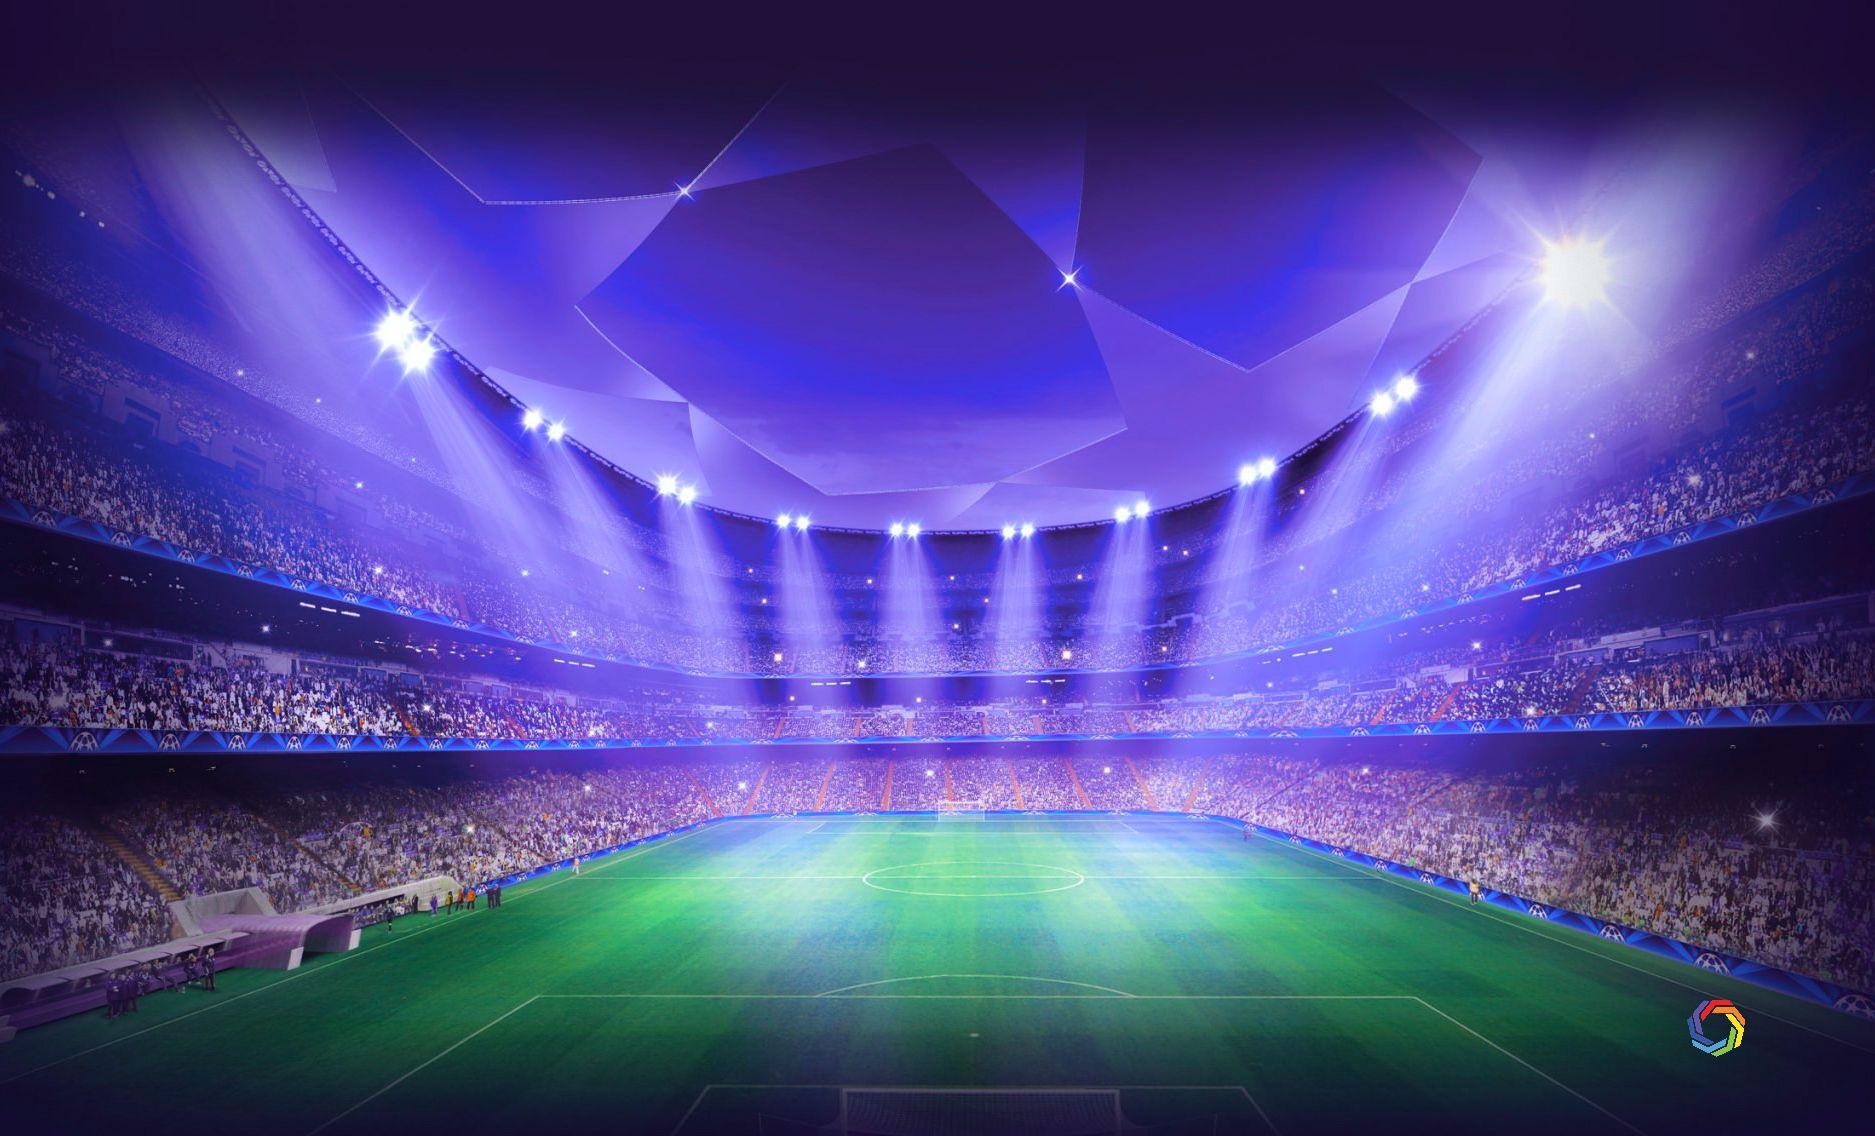 Download Free Sports Ultra Hd Wallpaper Free Hd Widescreen Wallpaper Or High Definition Widescreen Wallpa Sports Wallpapers Neymar Jr Wallpapers Nba Wallpapers